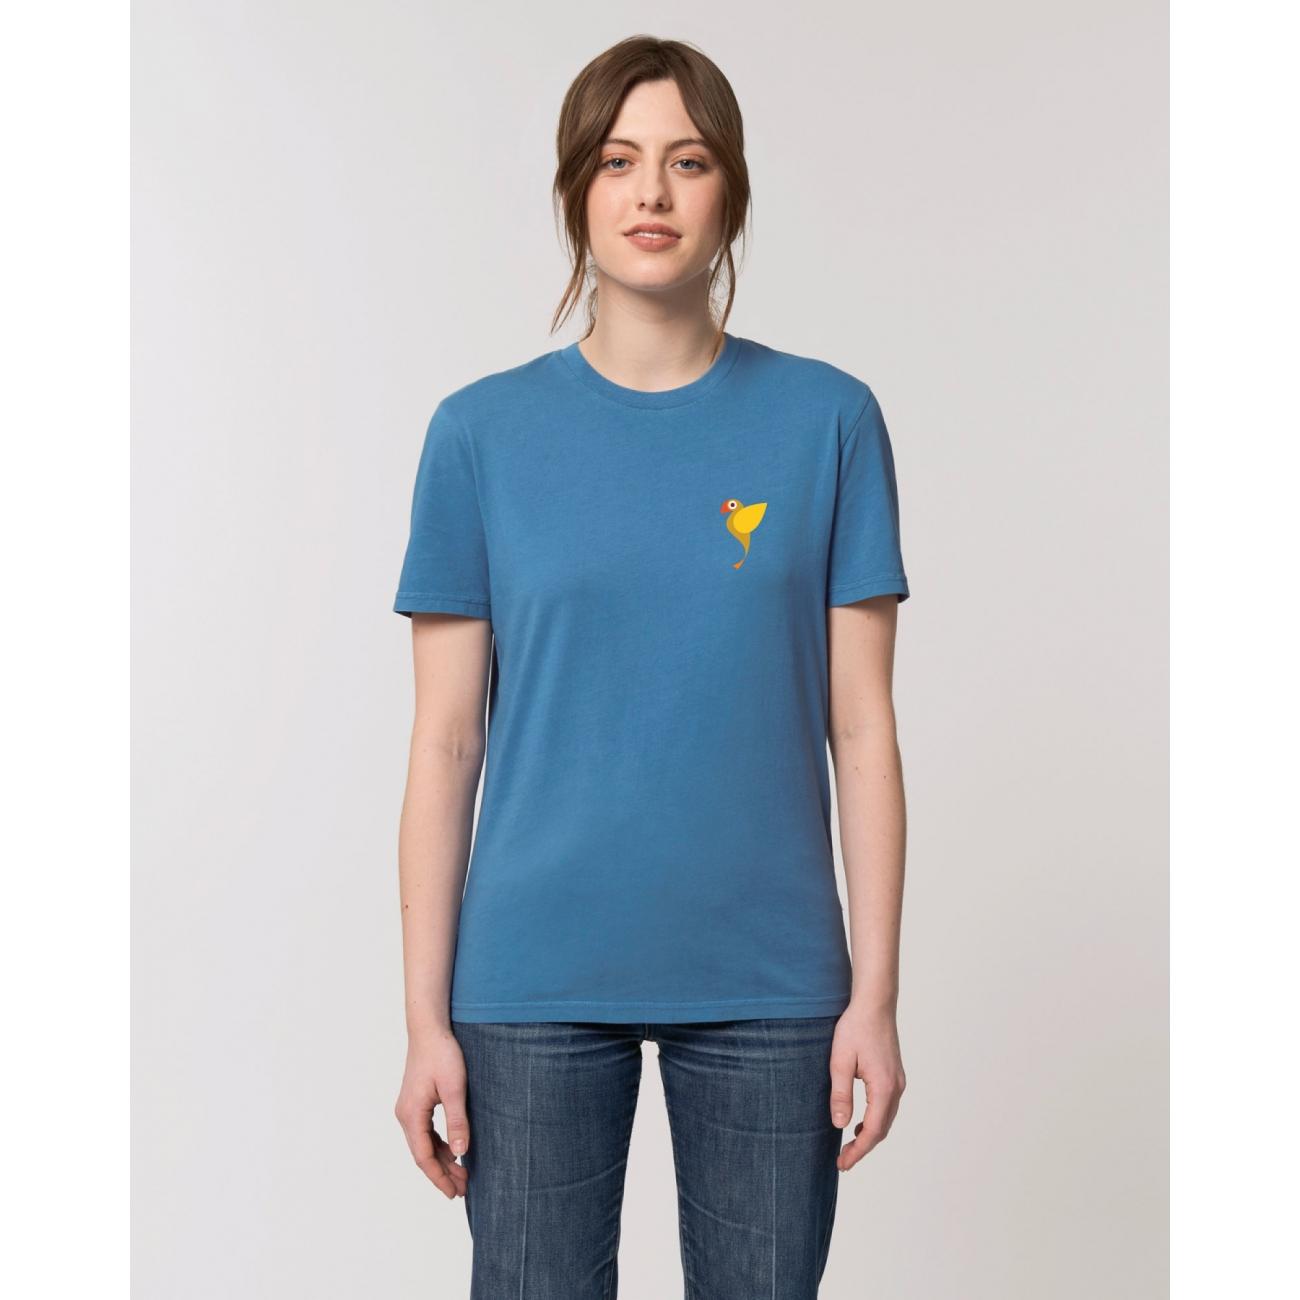 https://tee-shirt-bio.com/8932-thickbox_default/tee-shirt-bleu-delave-coton-bio-impression-coeur.jpg